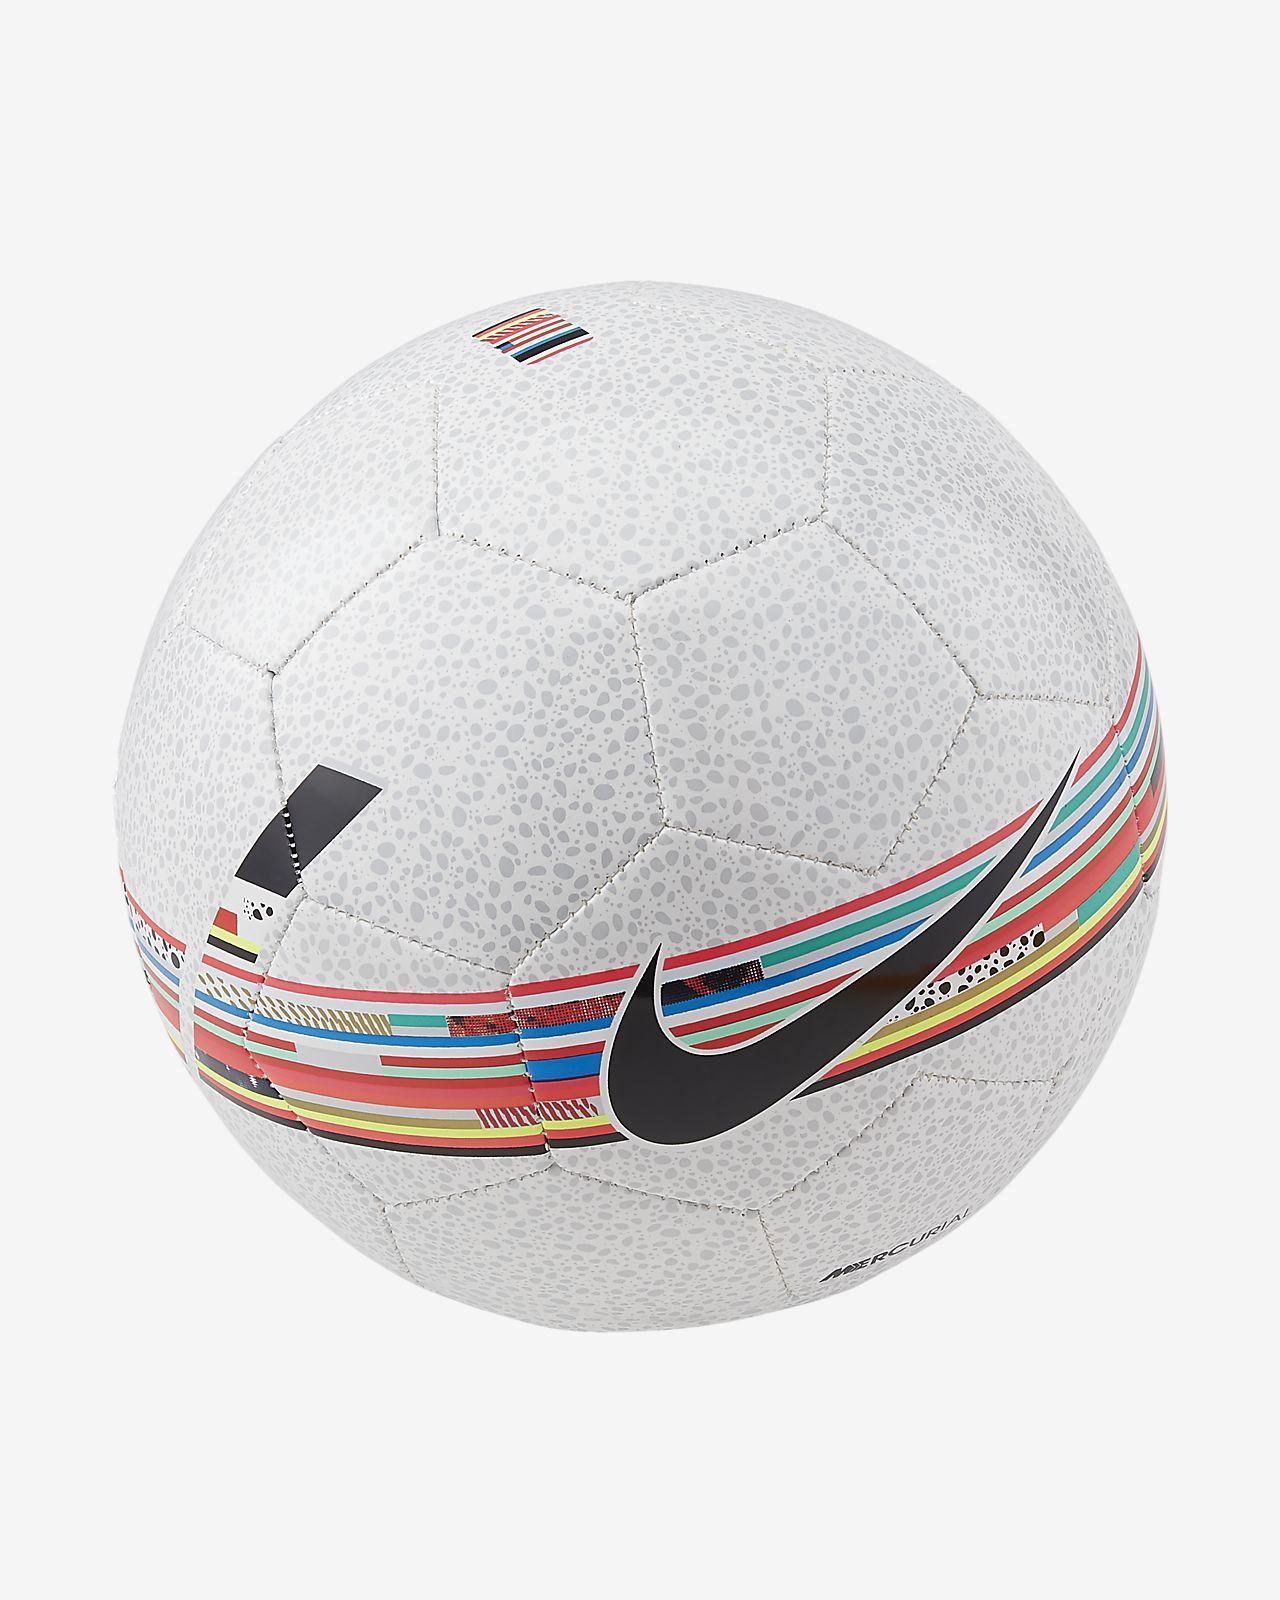 Футбольный мяч Nike Mercurial Prestige